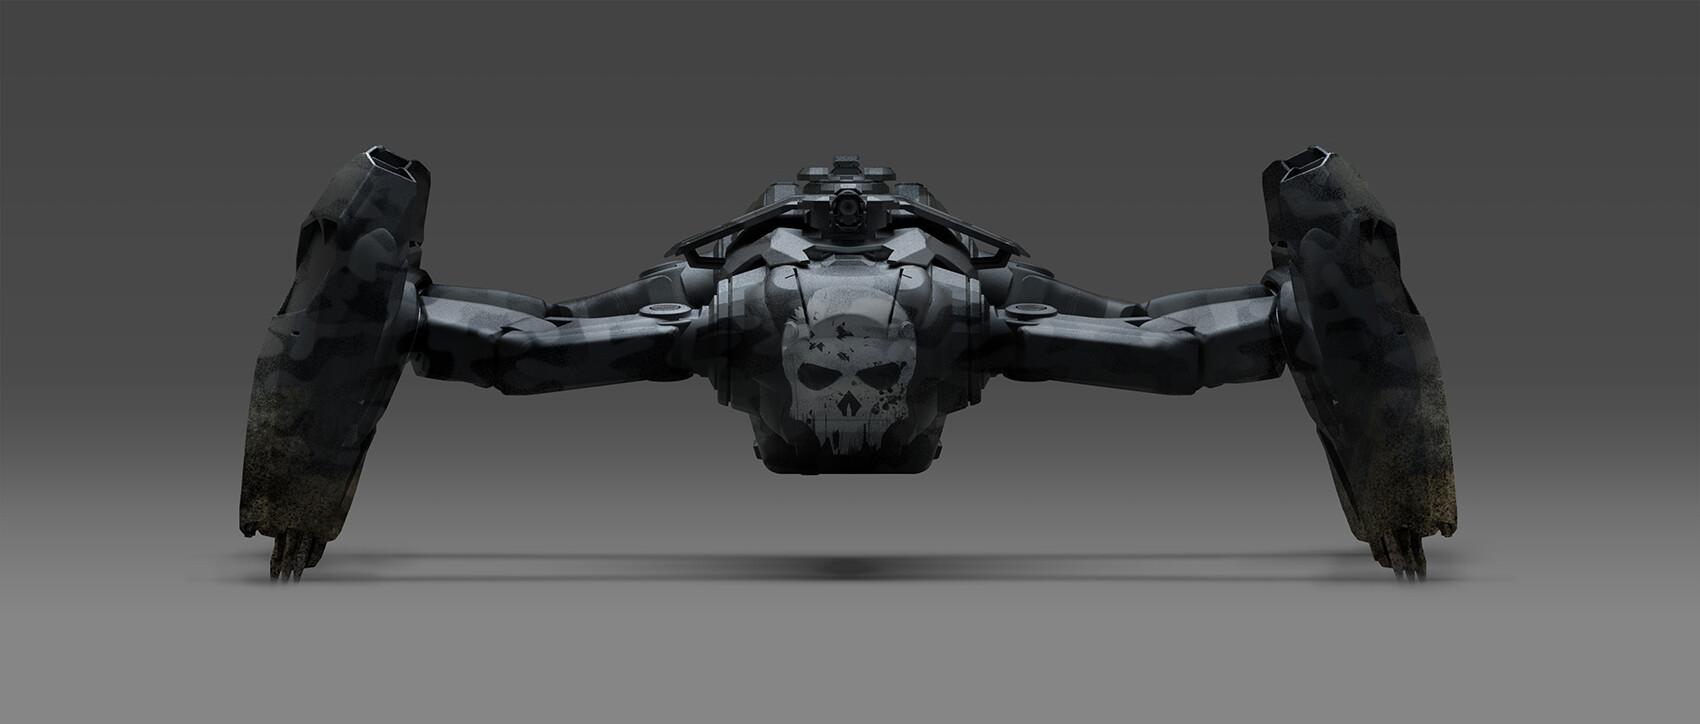 Alex ichim phoenix dragonfly camo skull front 06